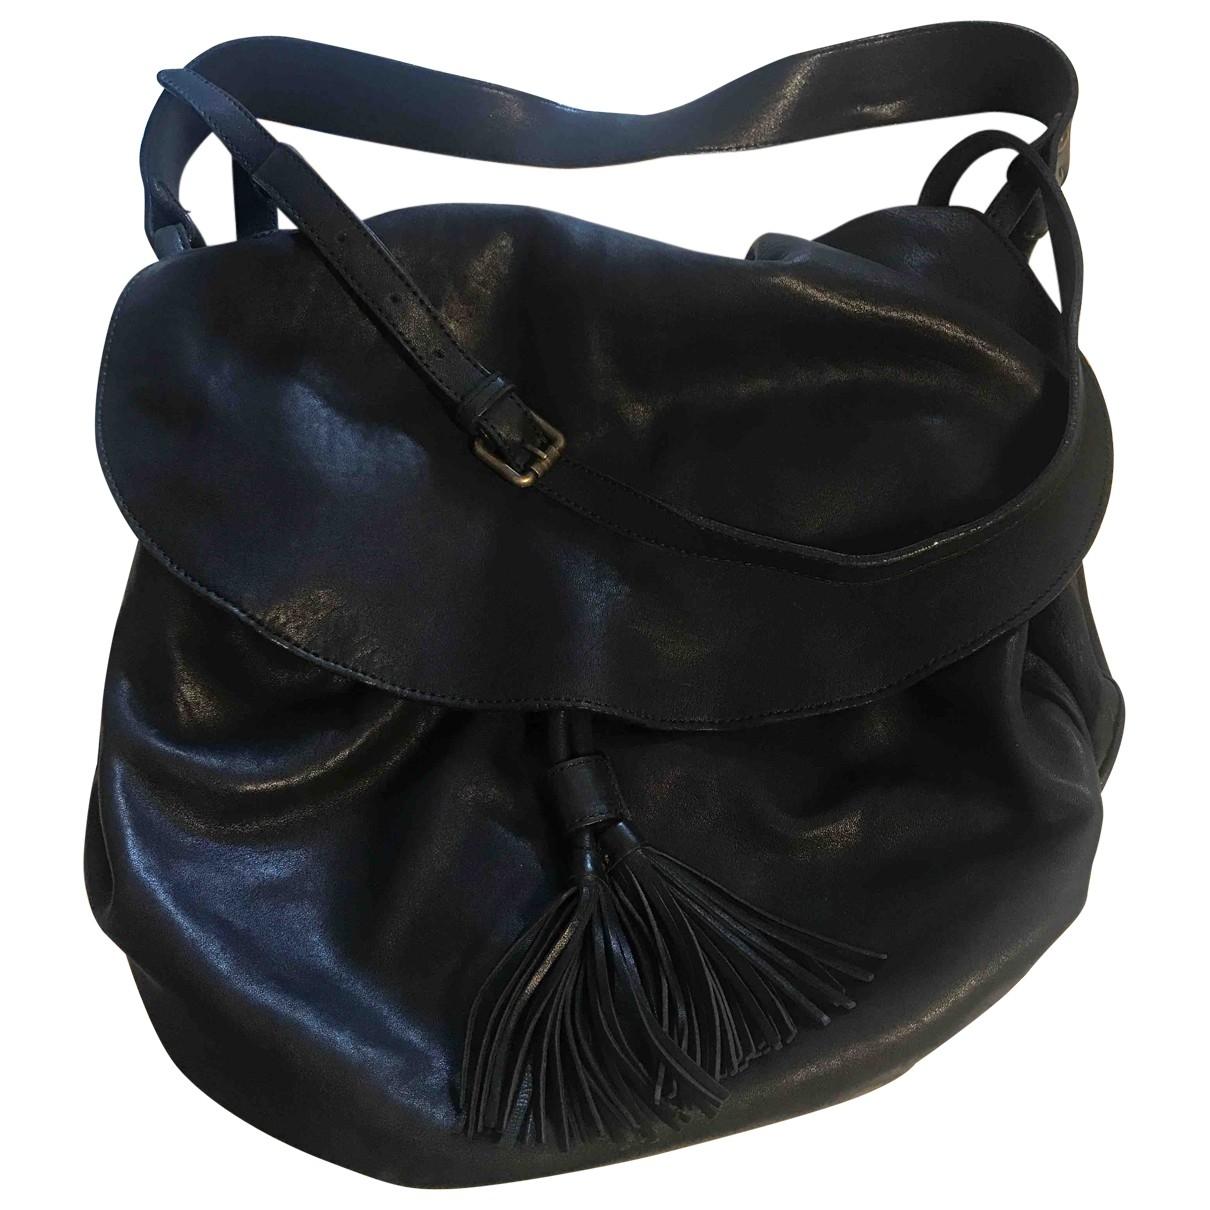 Gerard Darel Pom Bag Black Leather handbag for Women \N